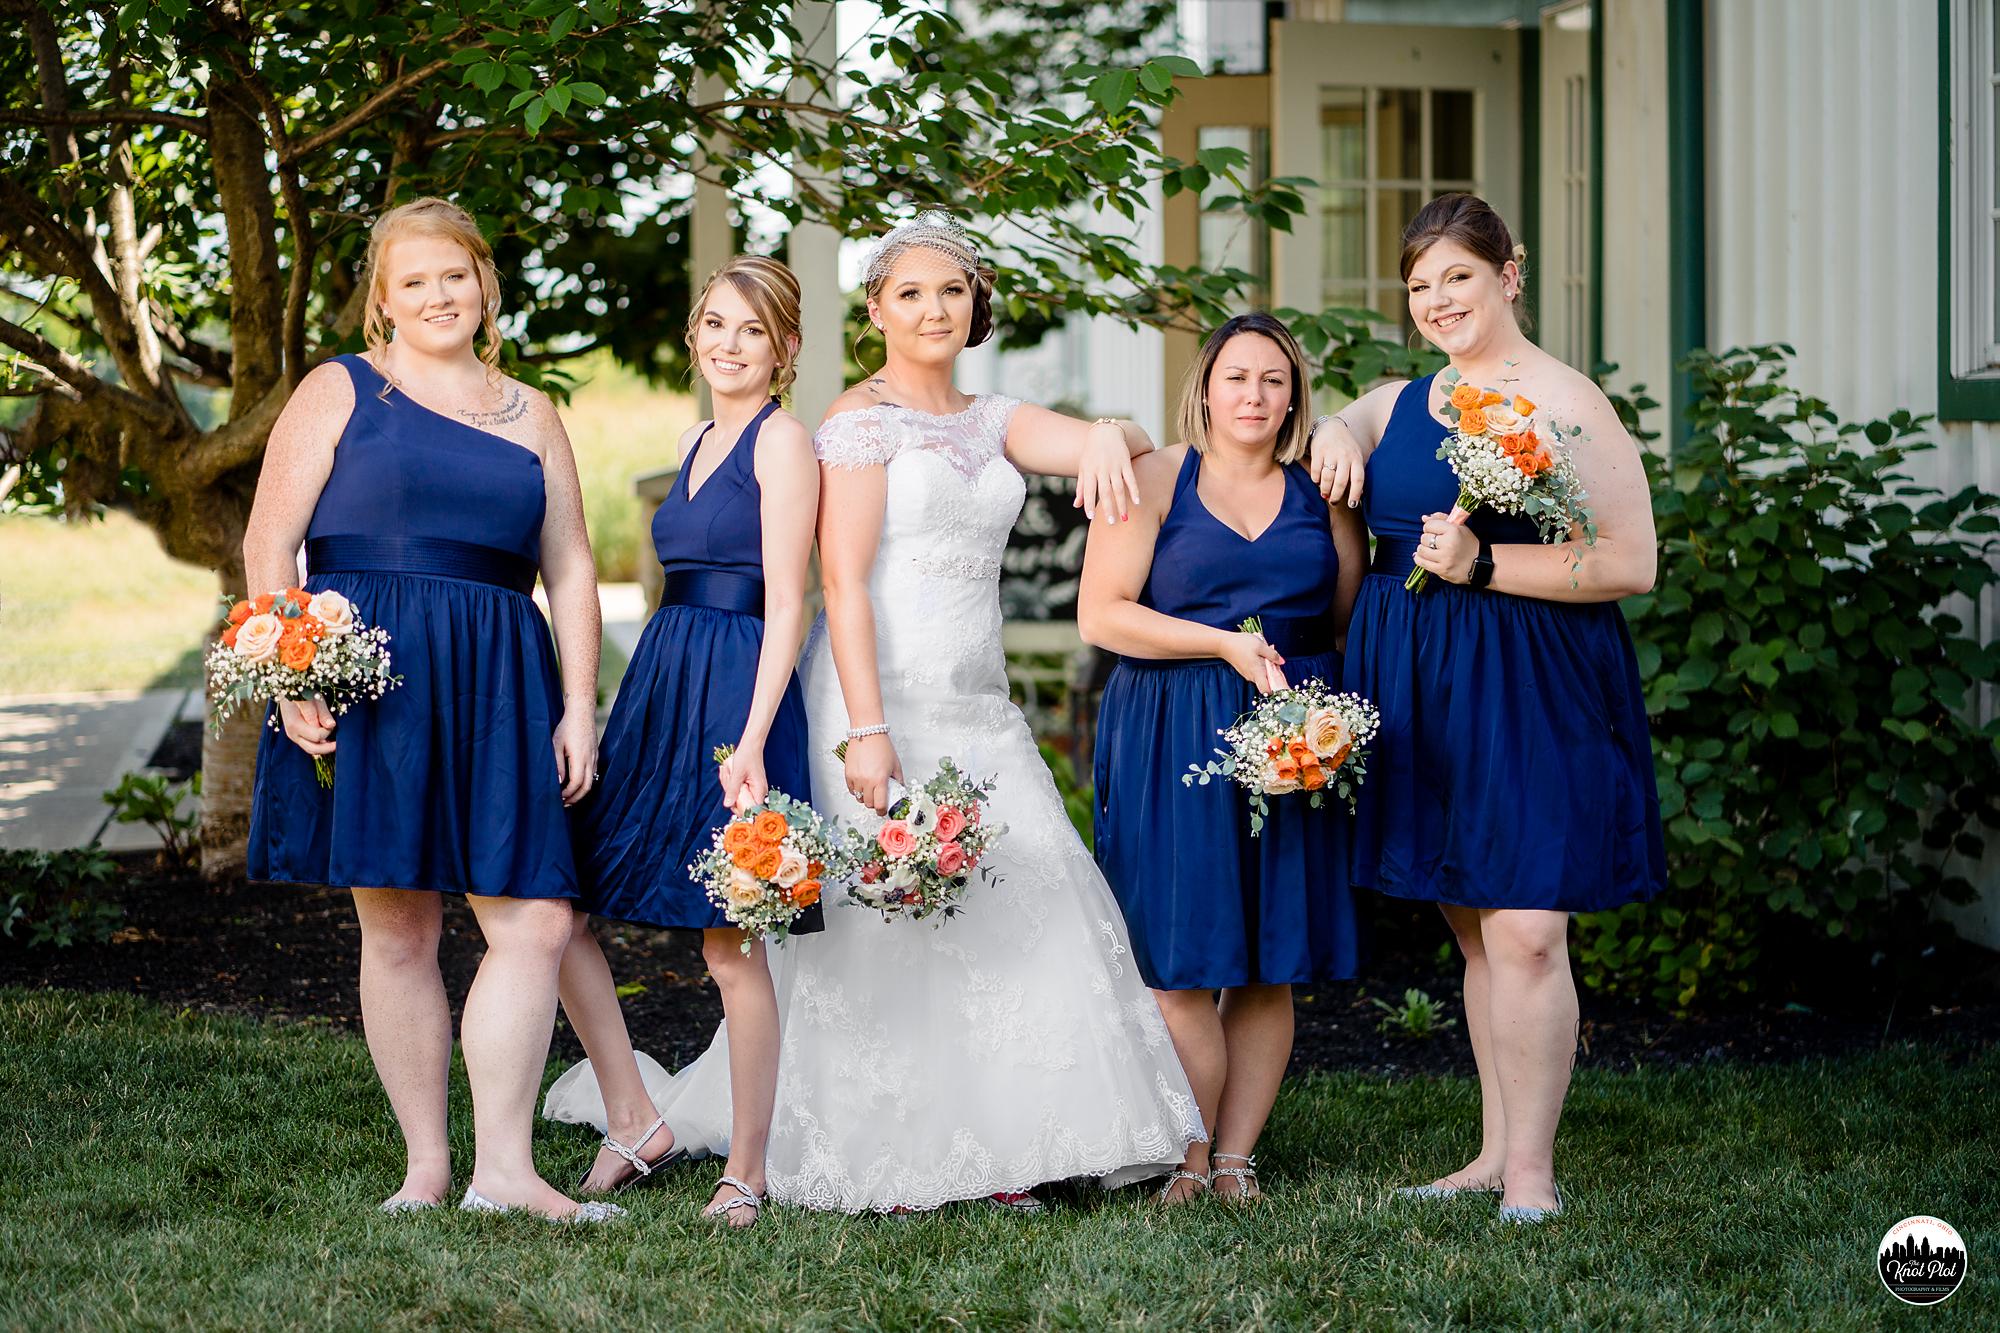 Muhlhauser-Barn-Wedding-Photography-9.jpg